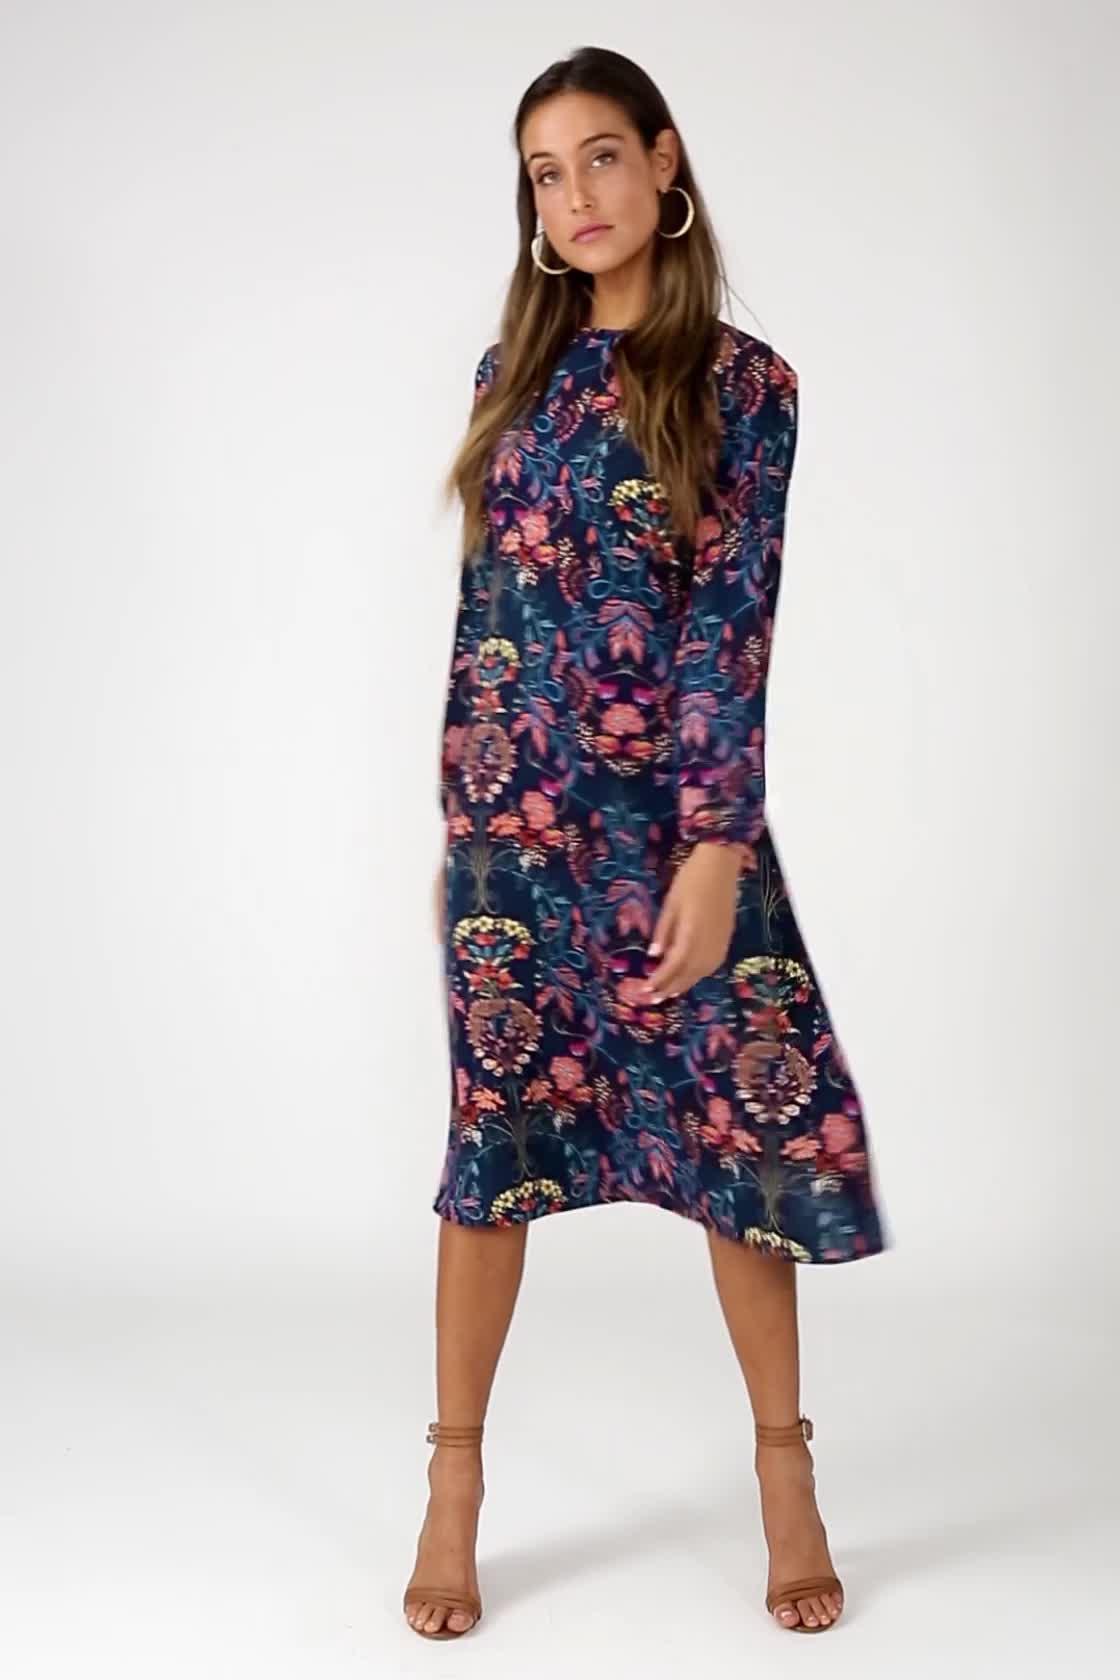 4f0980280229 Boho Midi Dress - Navy Blue Dress - Floral Print Dress - Long Sleeve ...